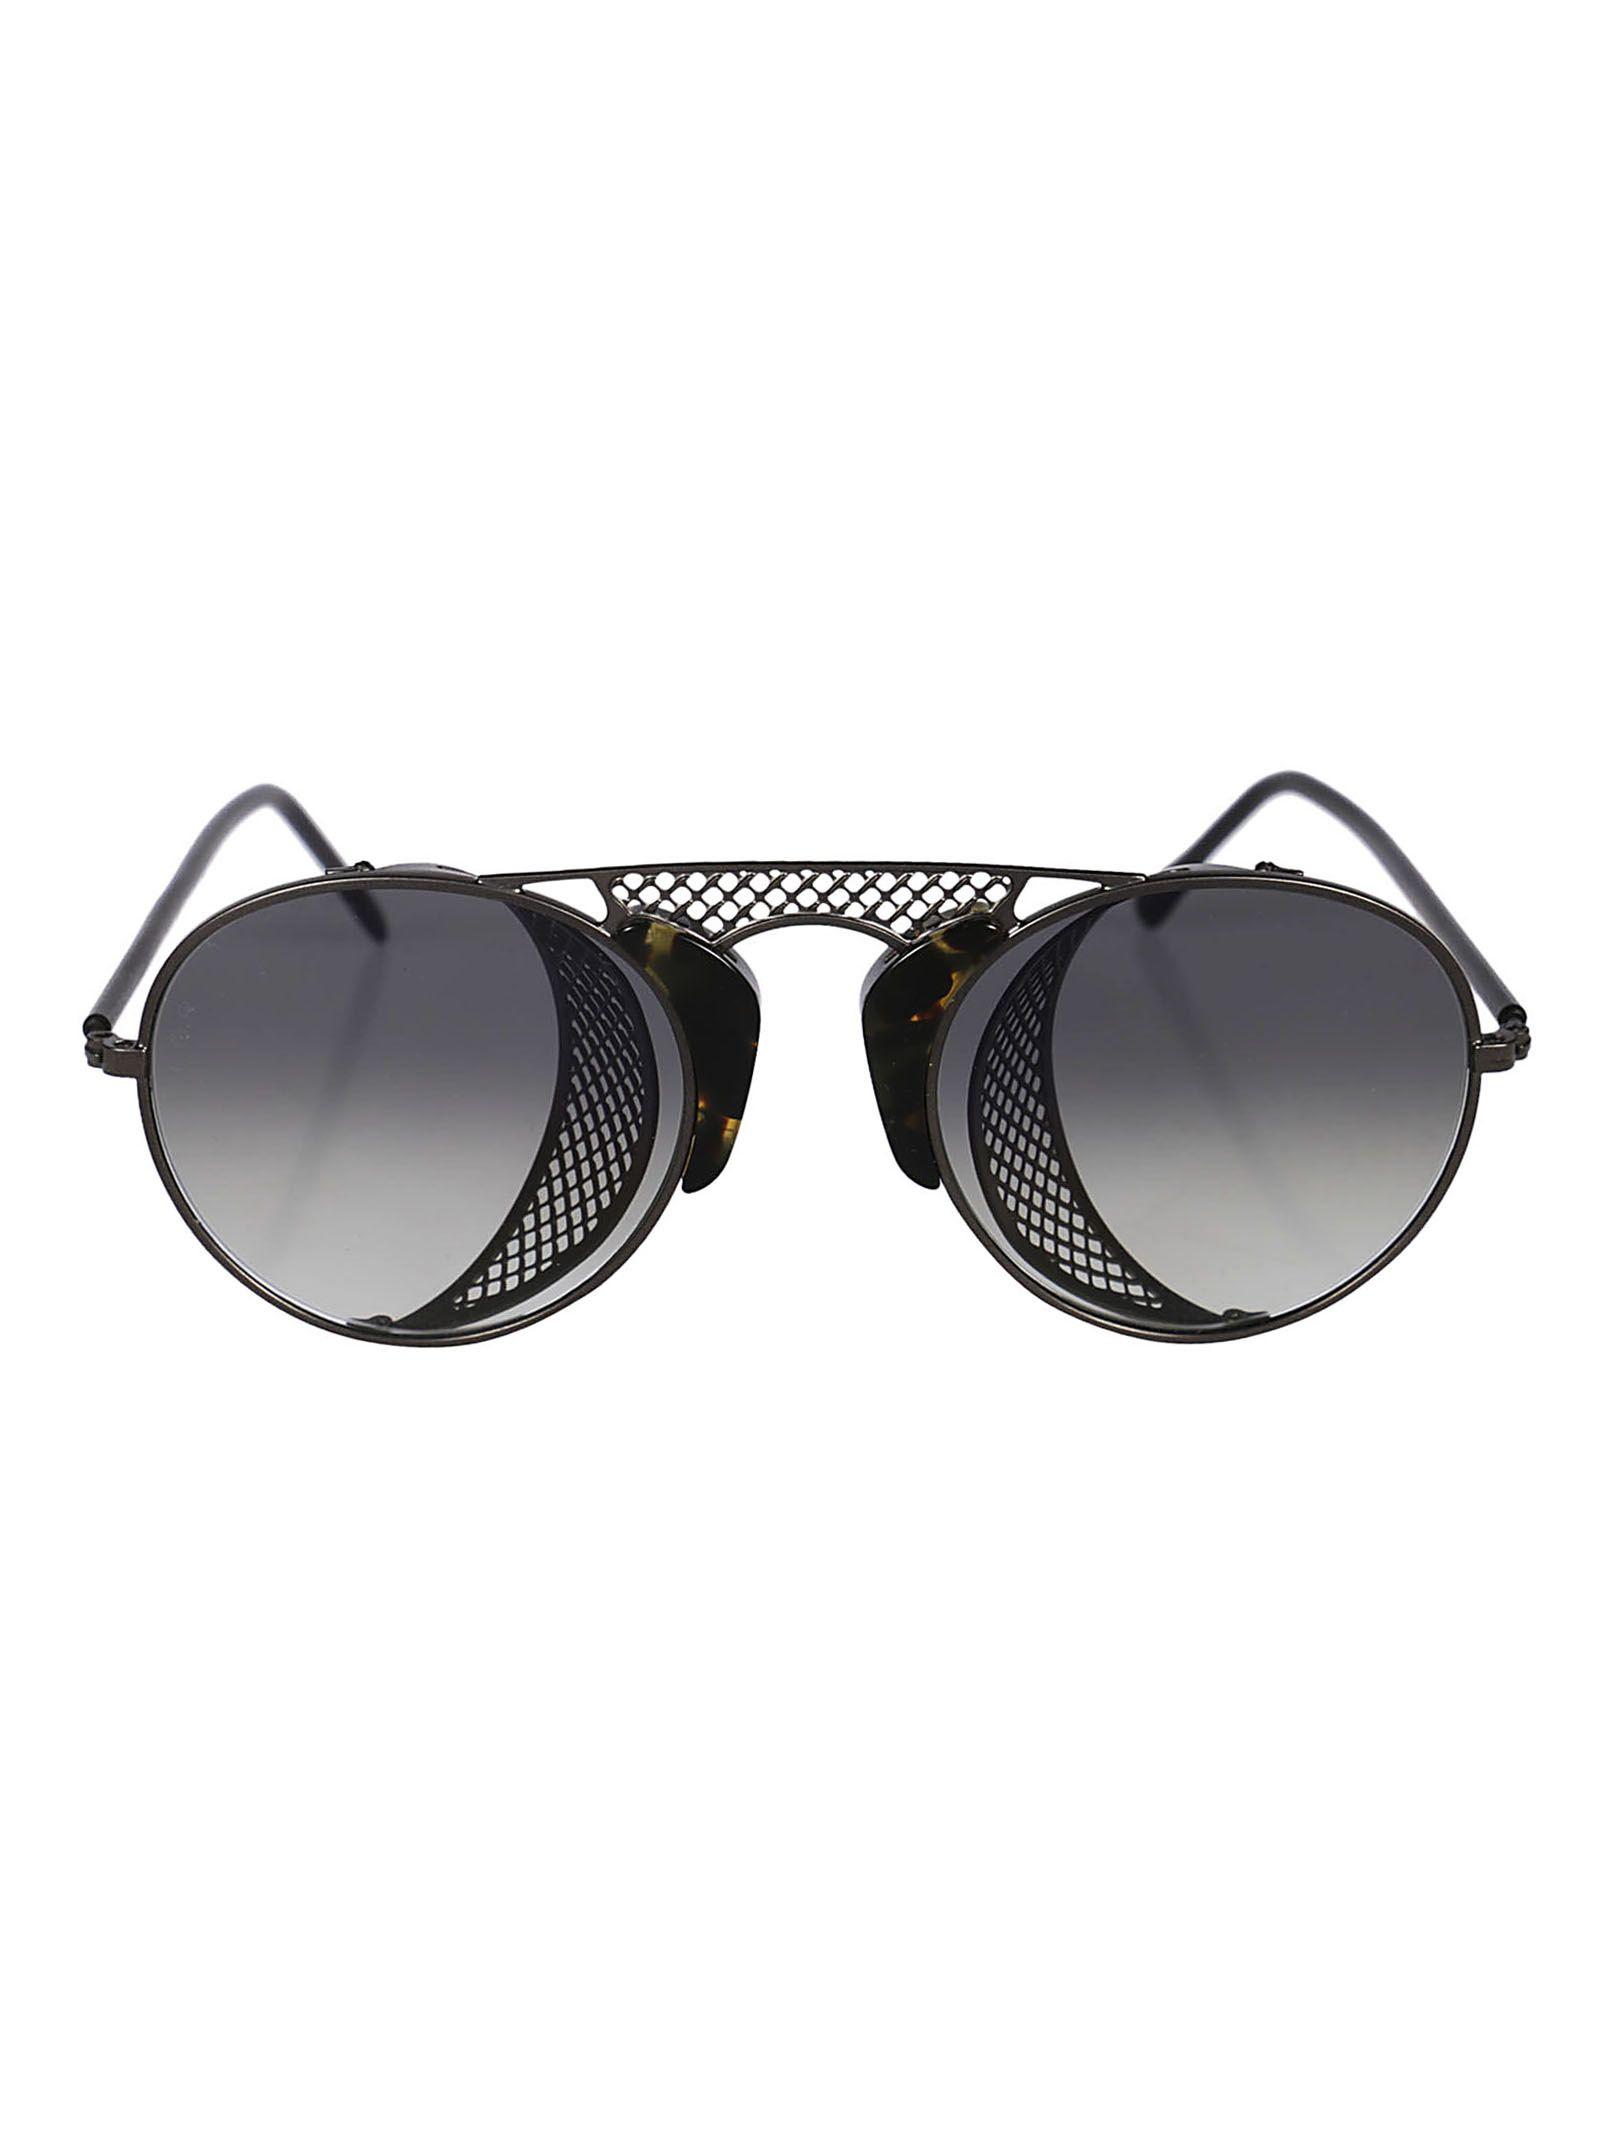 L.G.R Lgr Round Sunglasses in Gun Metal